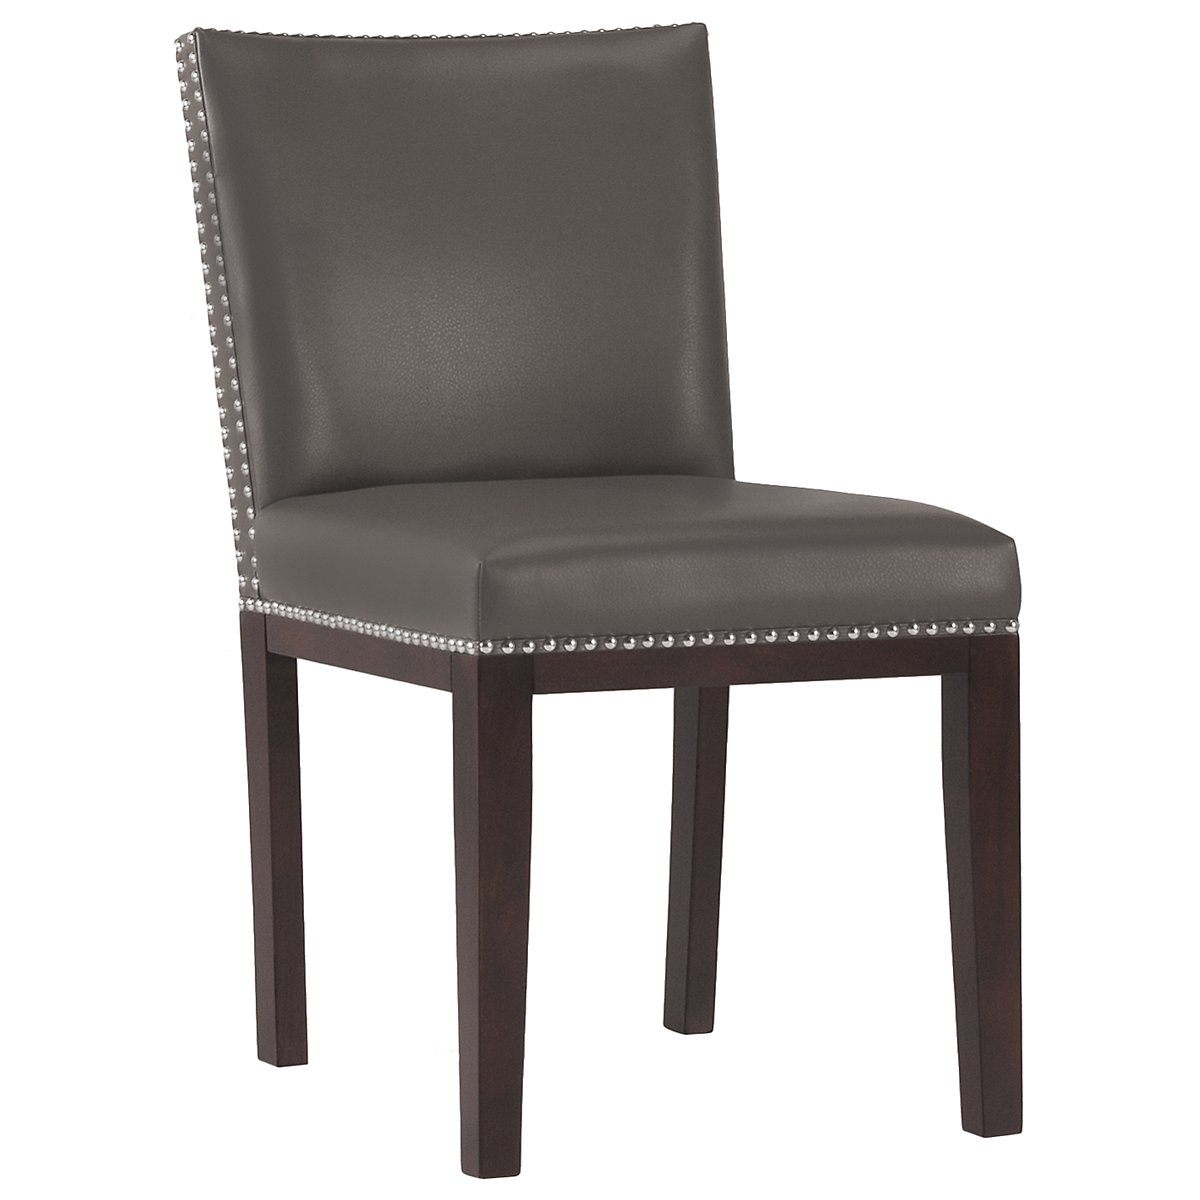 Tiffany Dark Gray Bonded Leather Side Chair